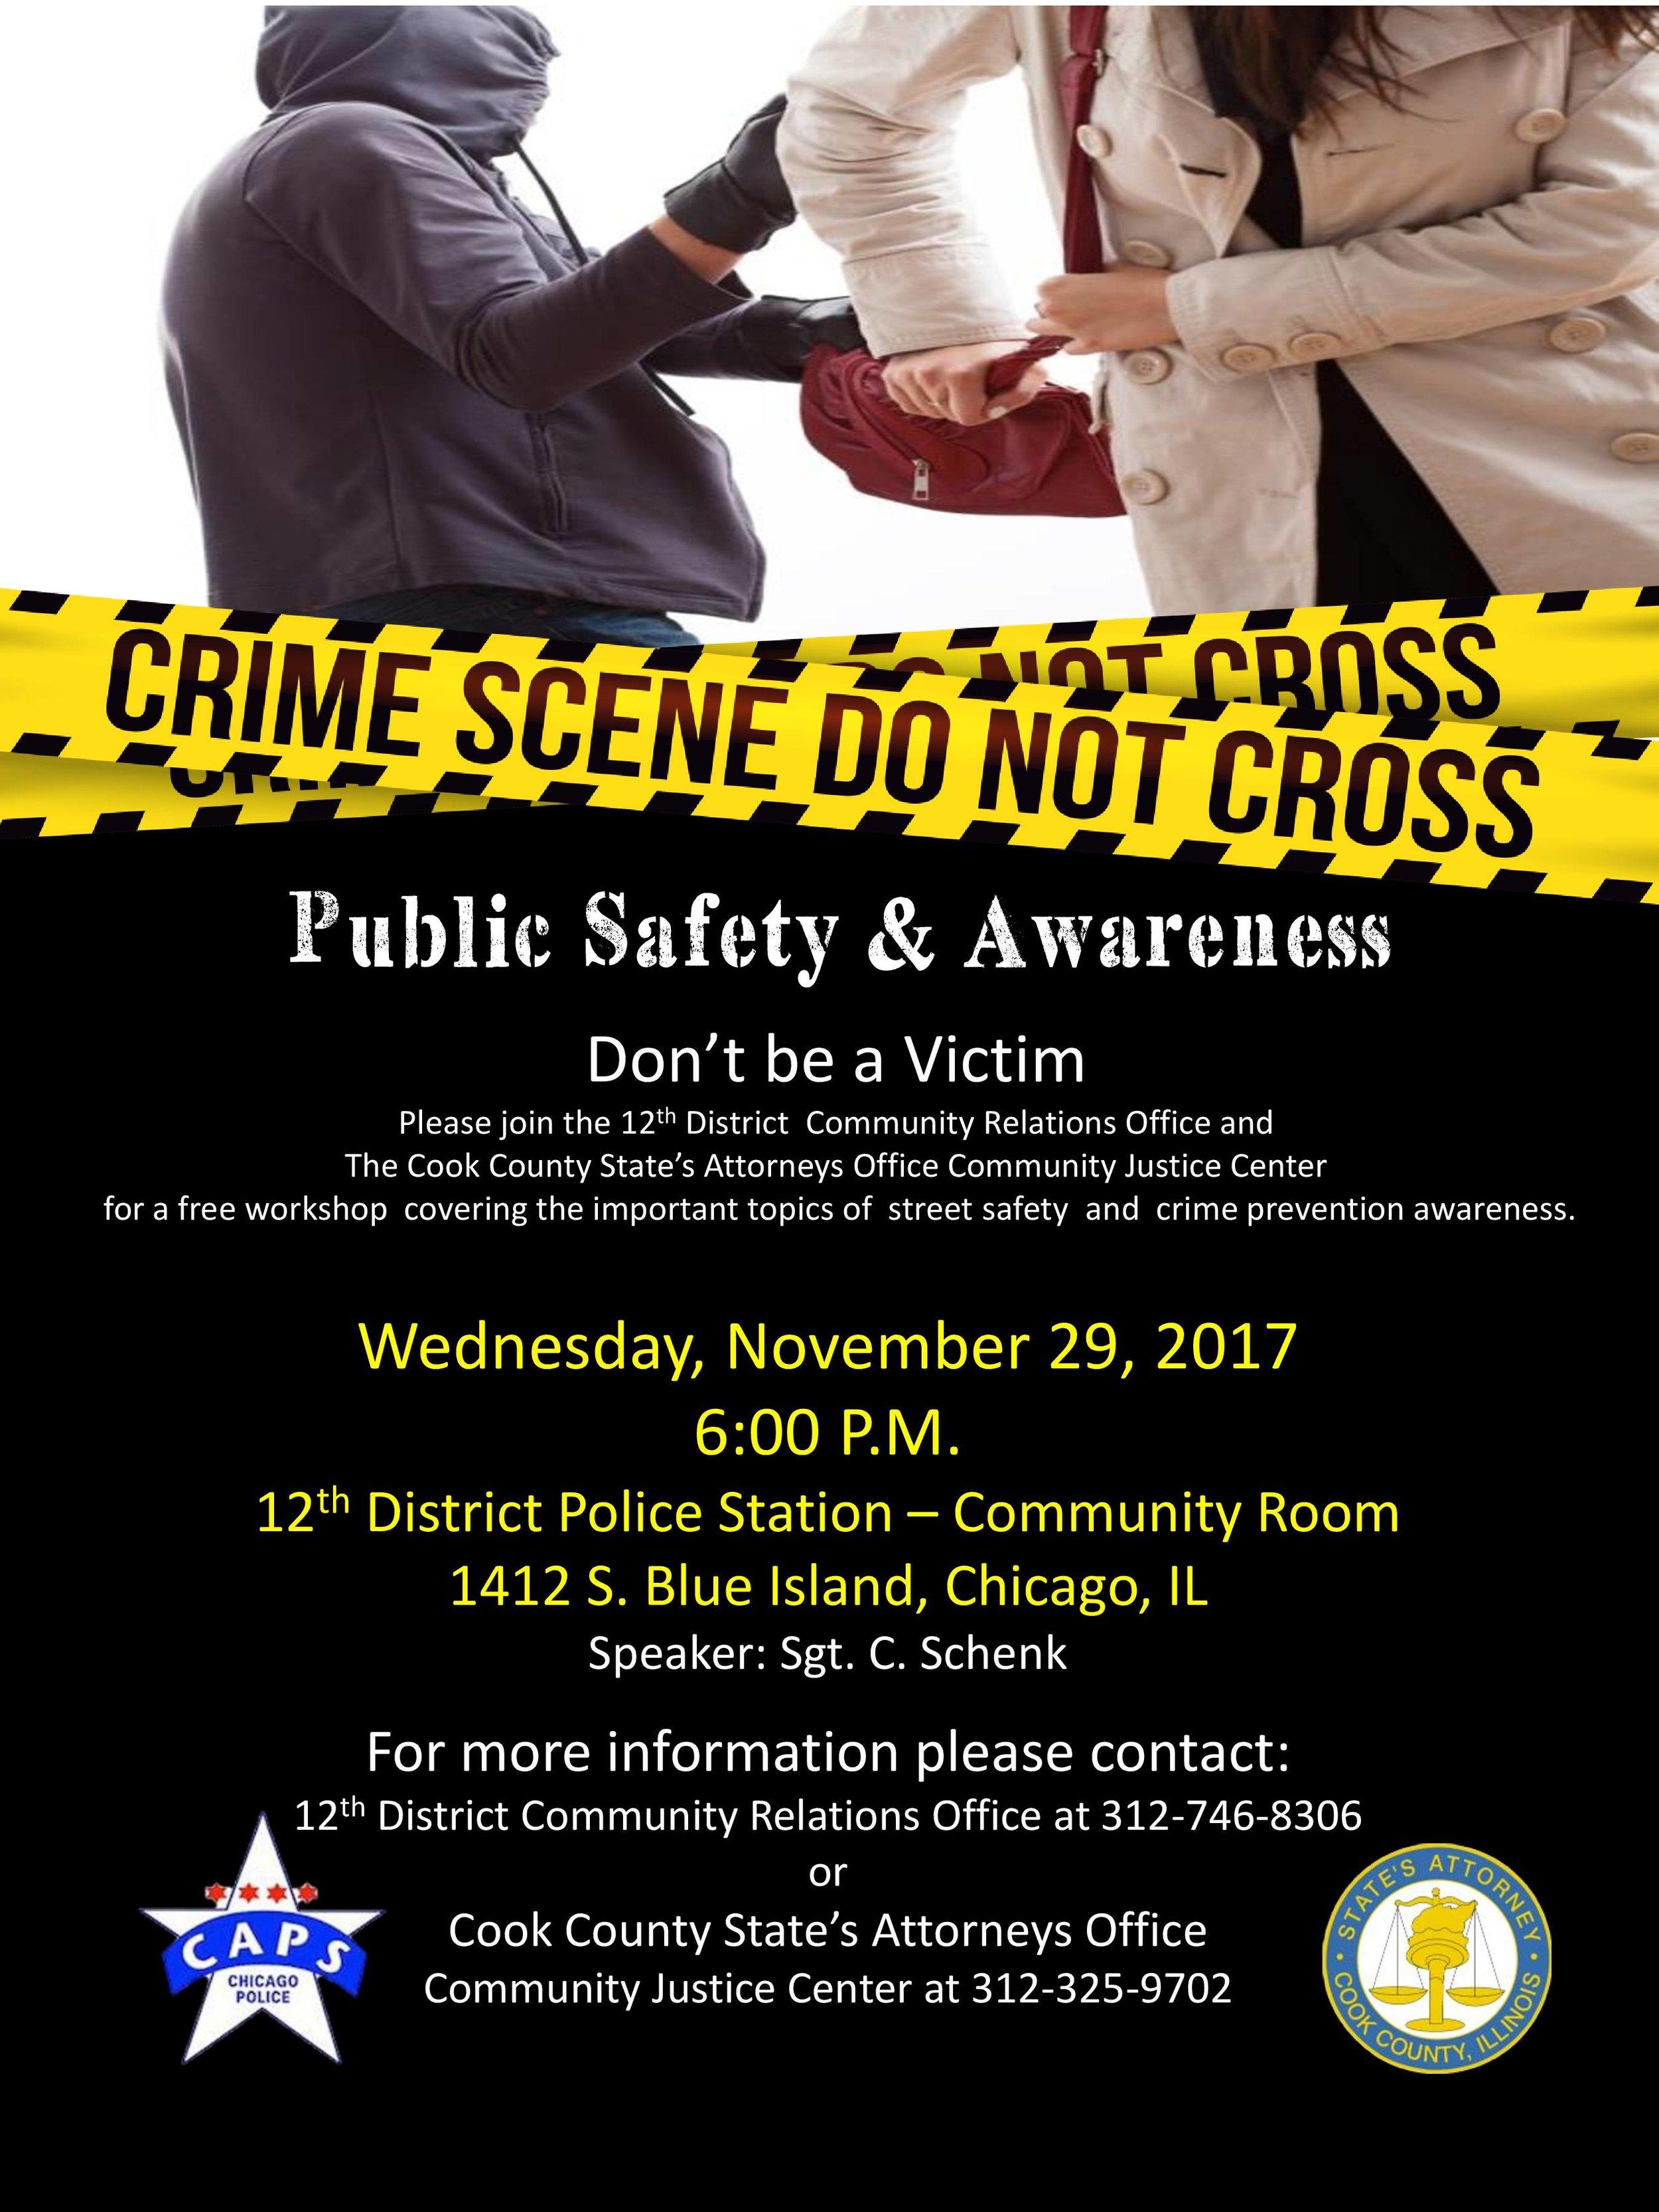 Public Safety & Awareness Flyer.jpg